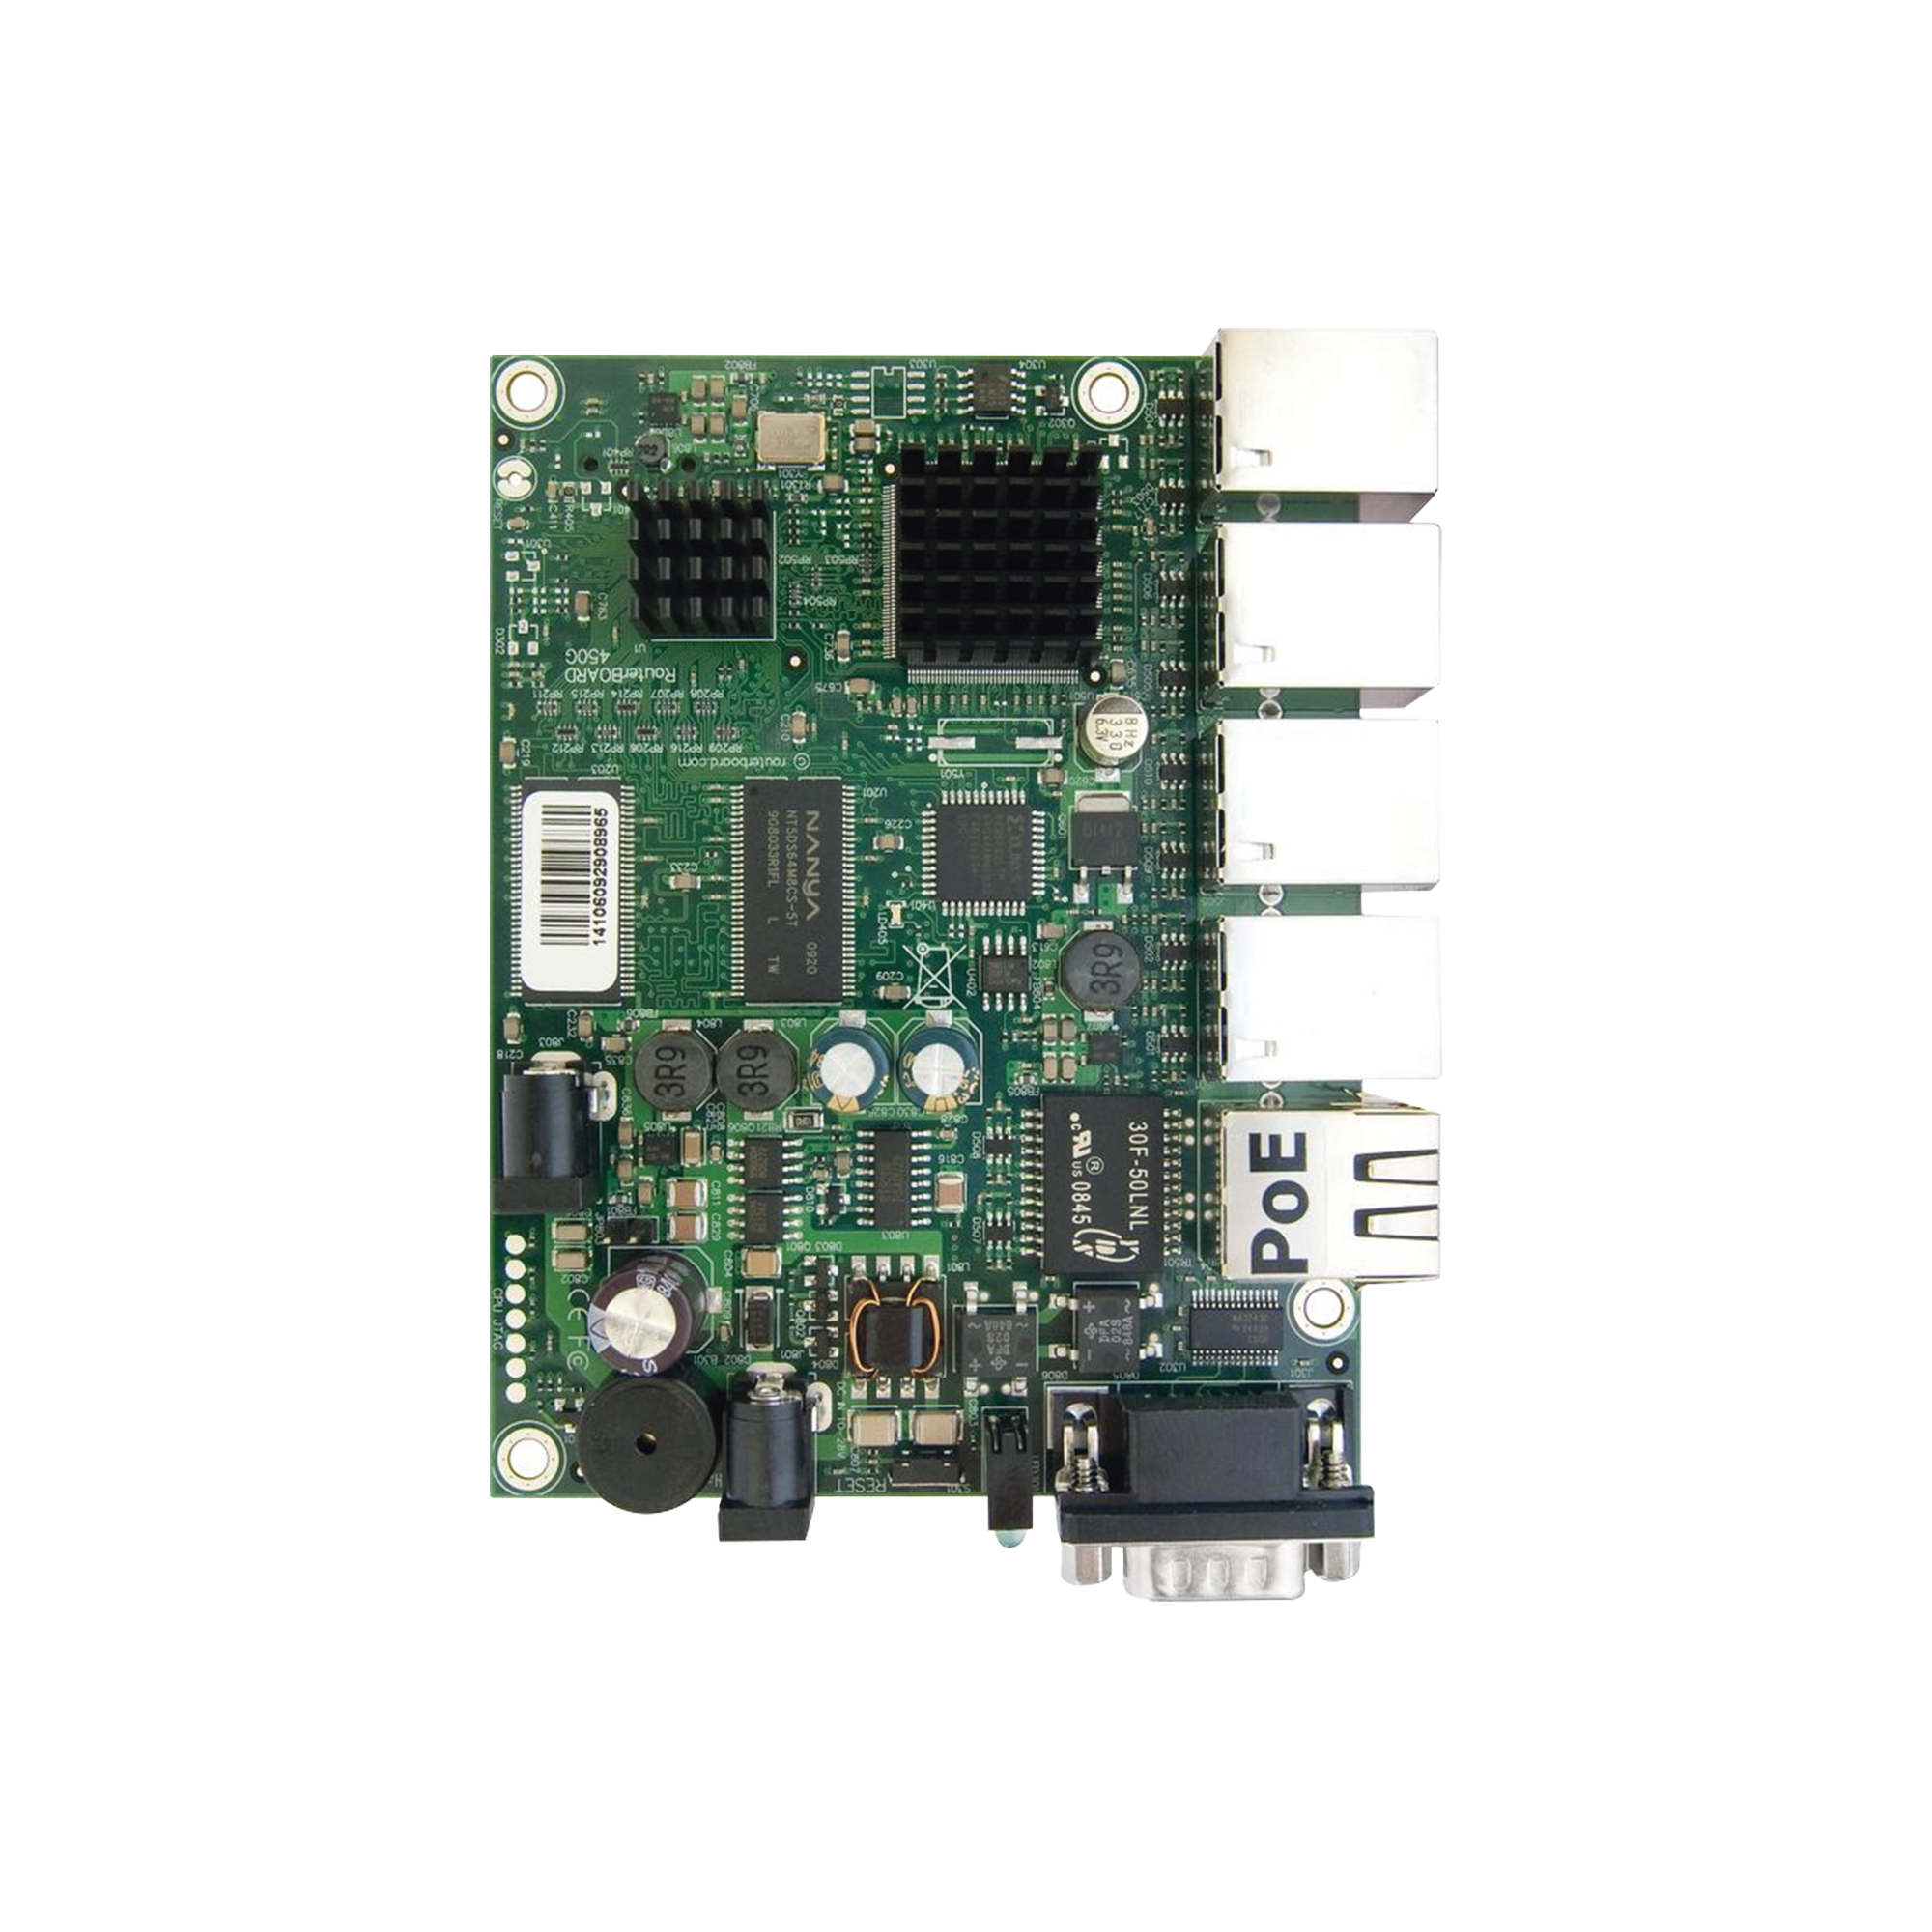 CPU de 680MHz, 256MB RAM, con 5 Puertos Gigabit Ethernet , Nivel de Licencia 5